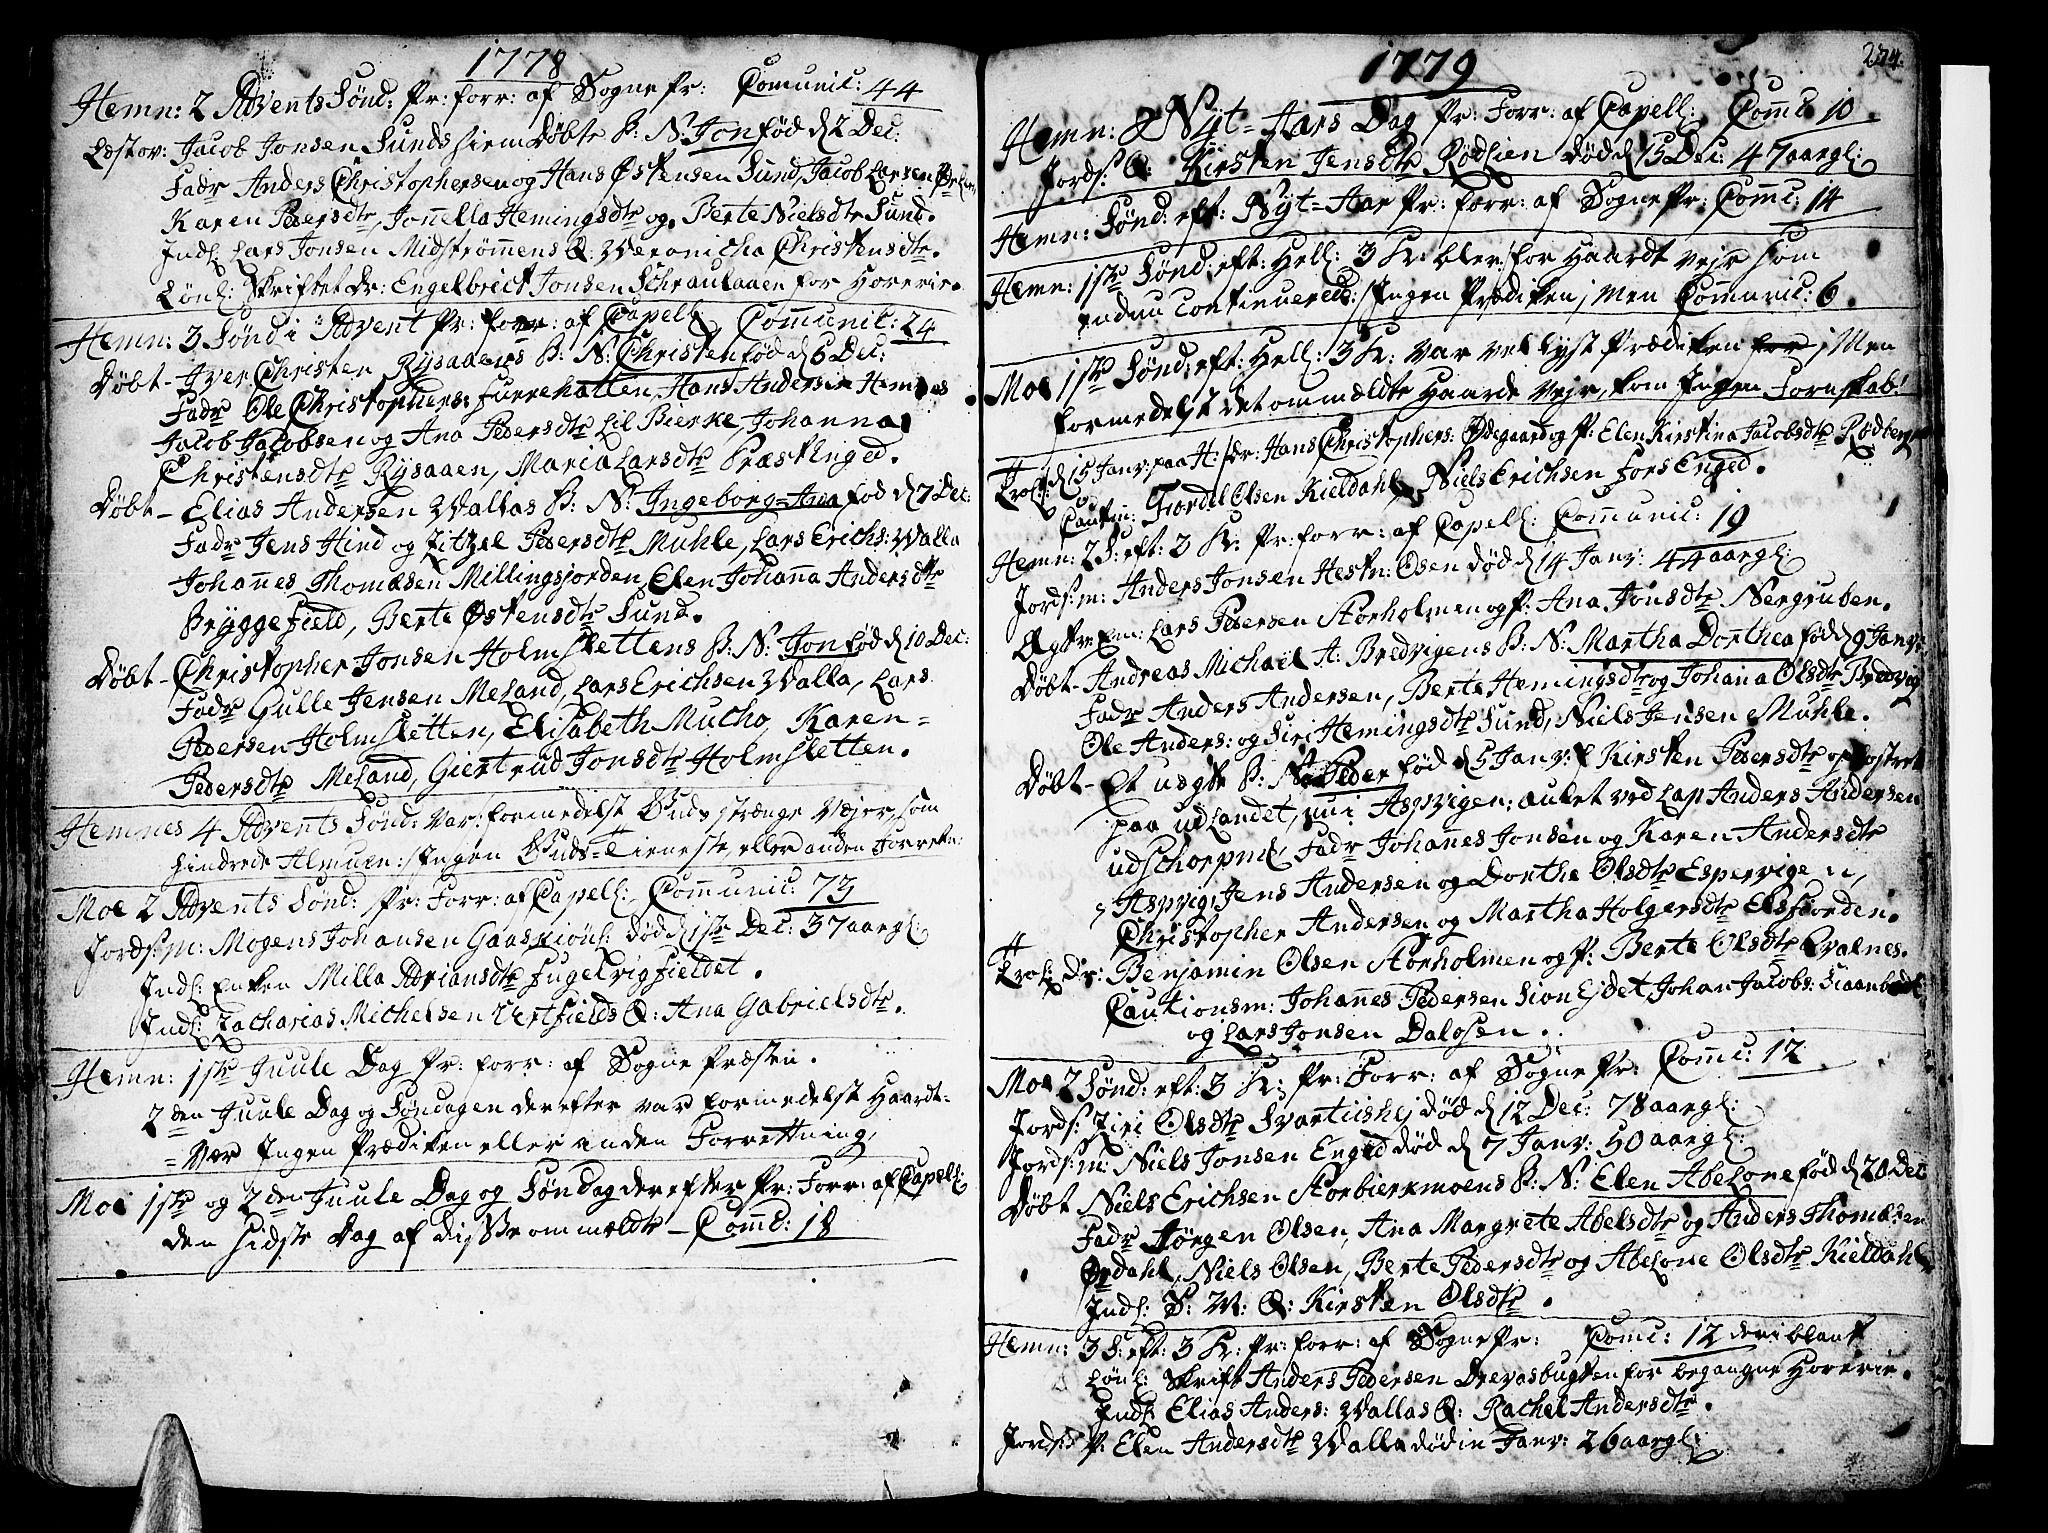 SAT, Ministerialprotokoller, klokkerbøker og fødselsregistre - Nordland, 825/L0348: Ministerialbok nr. 825A04, 1752-1788, s. 274